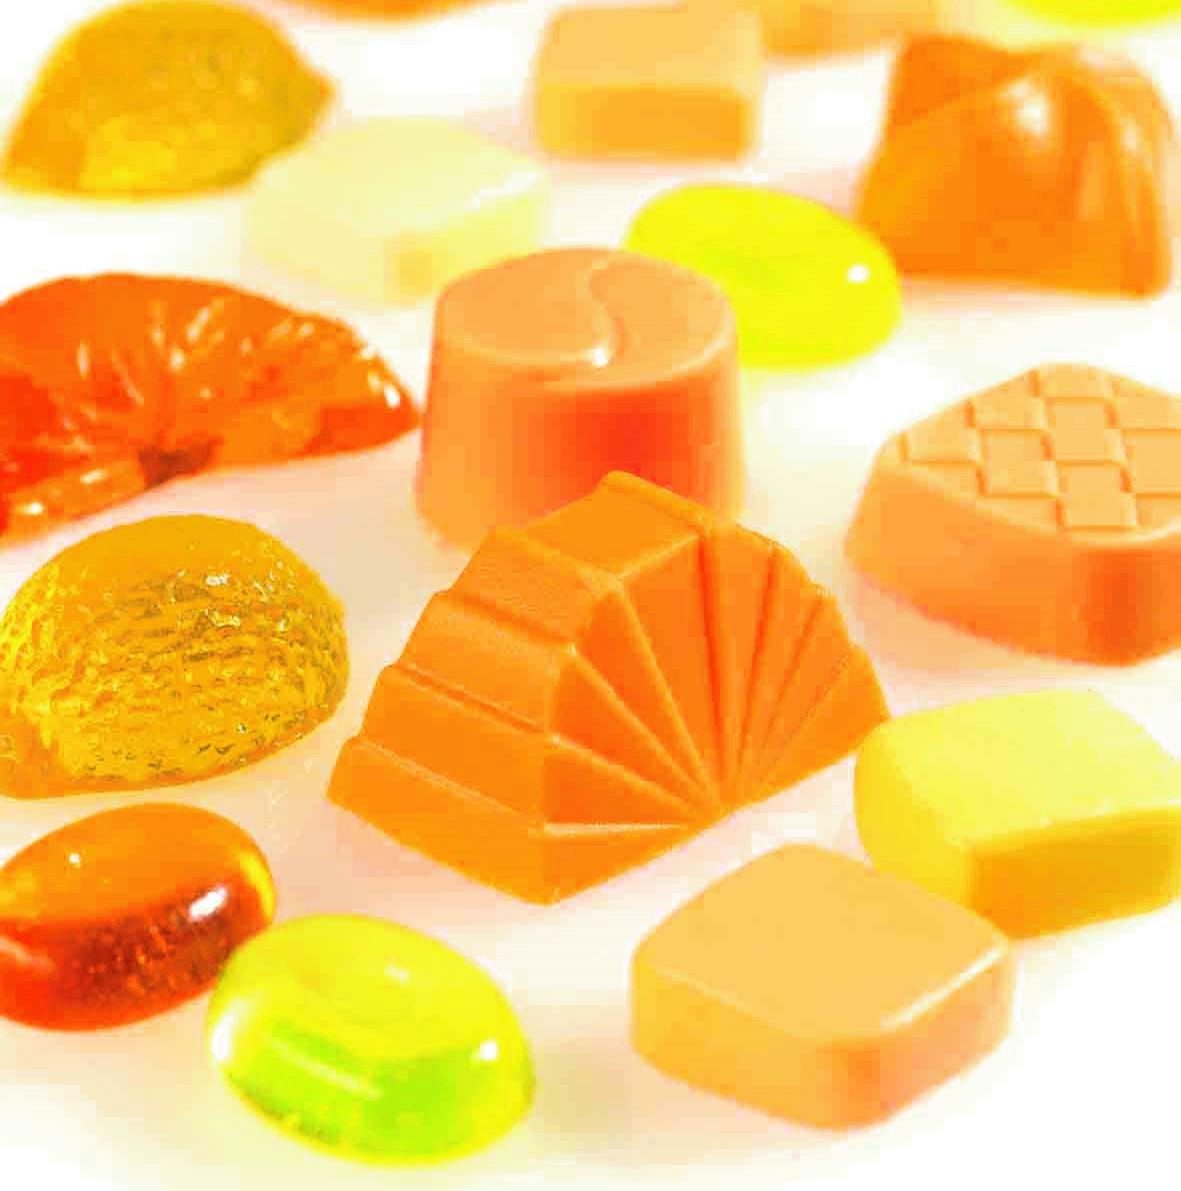 Sensient Food Colors Extend Their Natural Food Coloring Range To ...